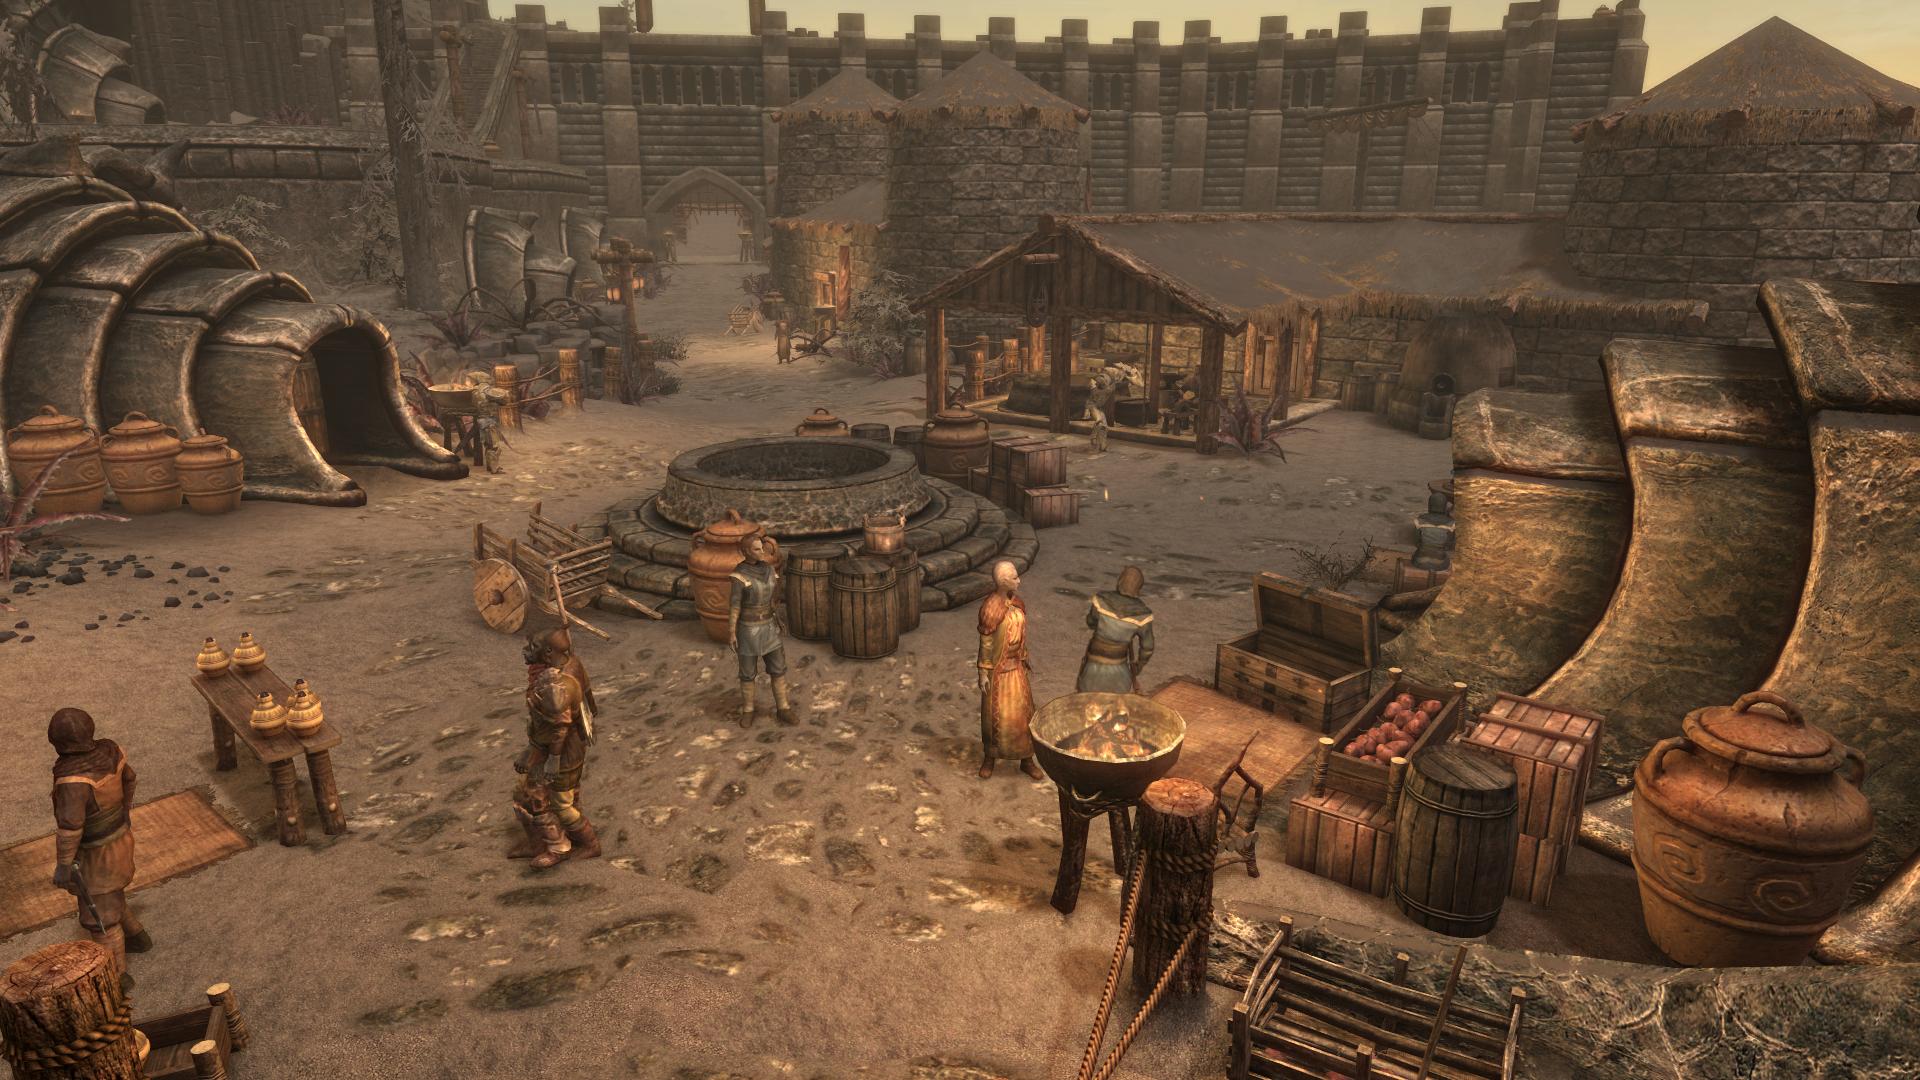 Mercado de Roca del Cuervo